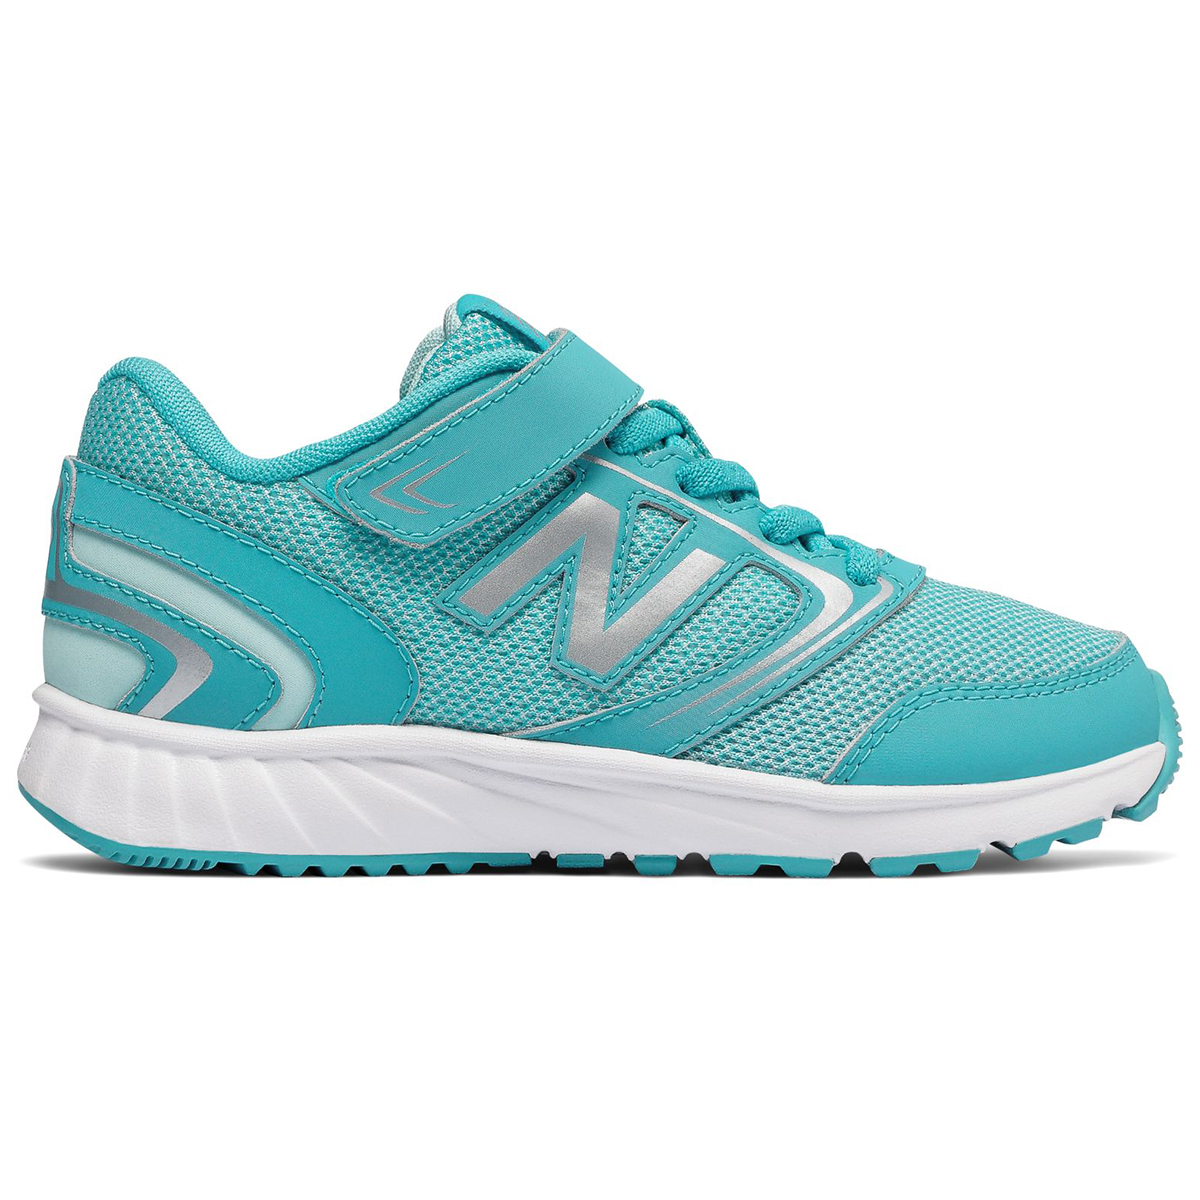 New Balance Little Girls' Preschool 455V1 Alternate Closure Sneakers - Blue, 11